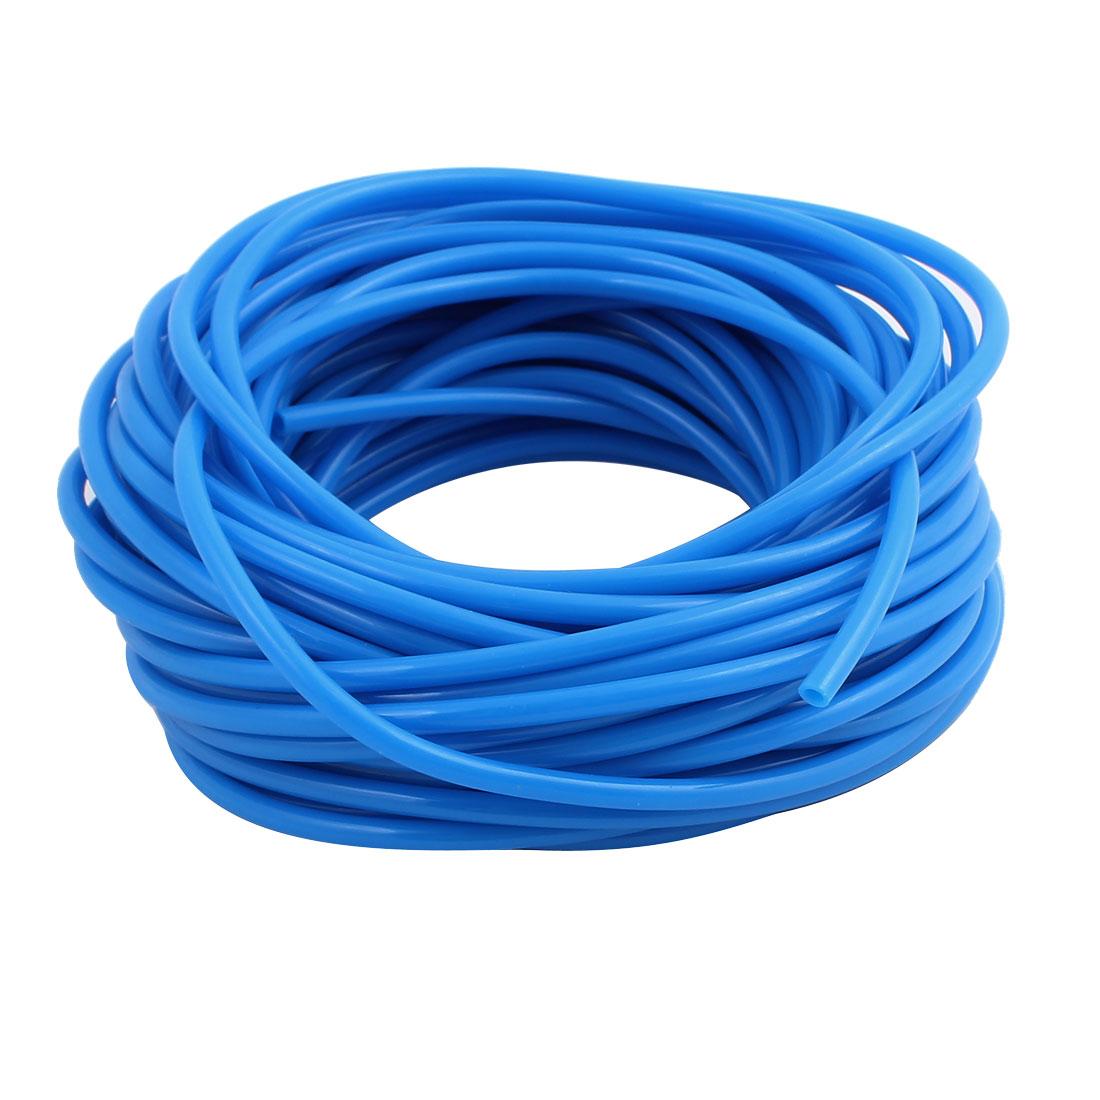 2.5mm x 4mm Flexible Pneumatic Polyurethane PU Hose Pipe Tube Blue 15m Length